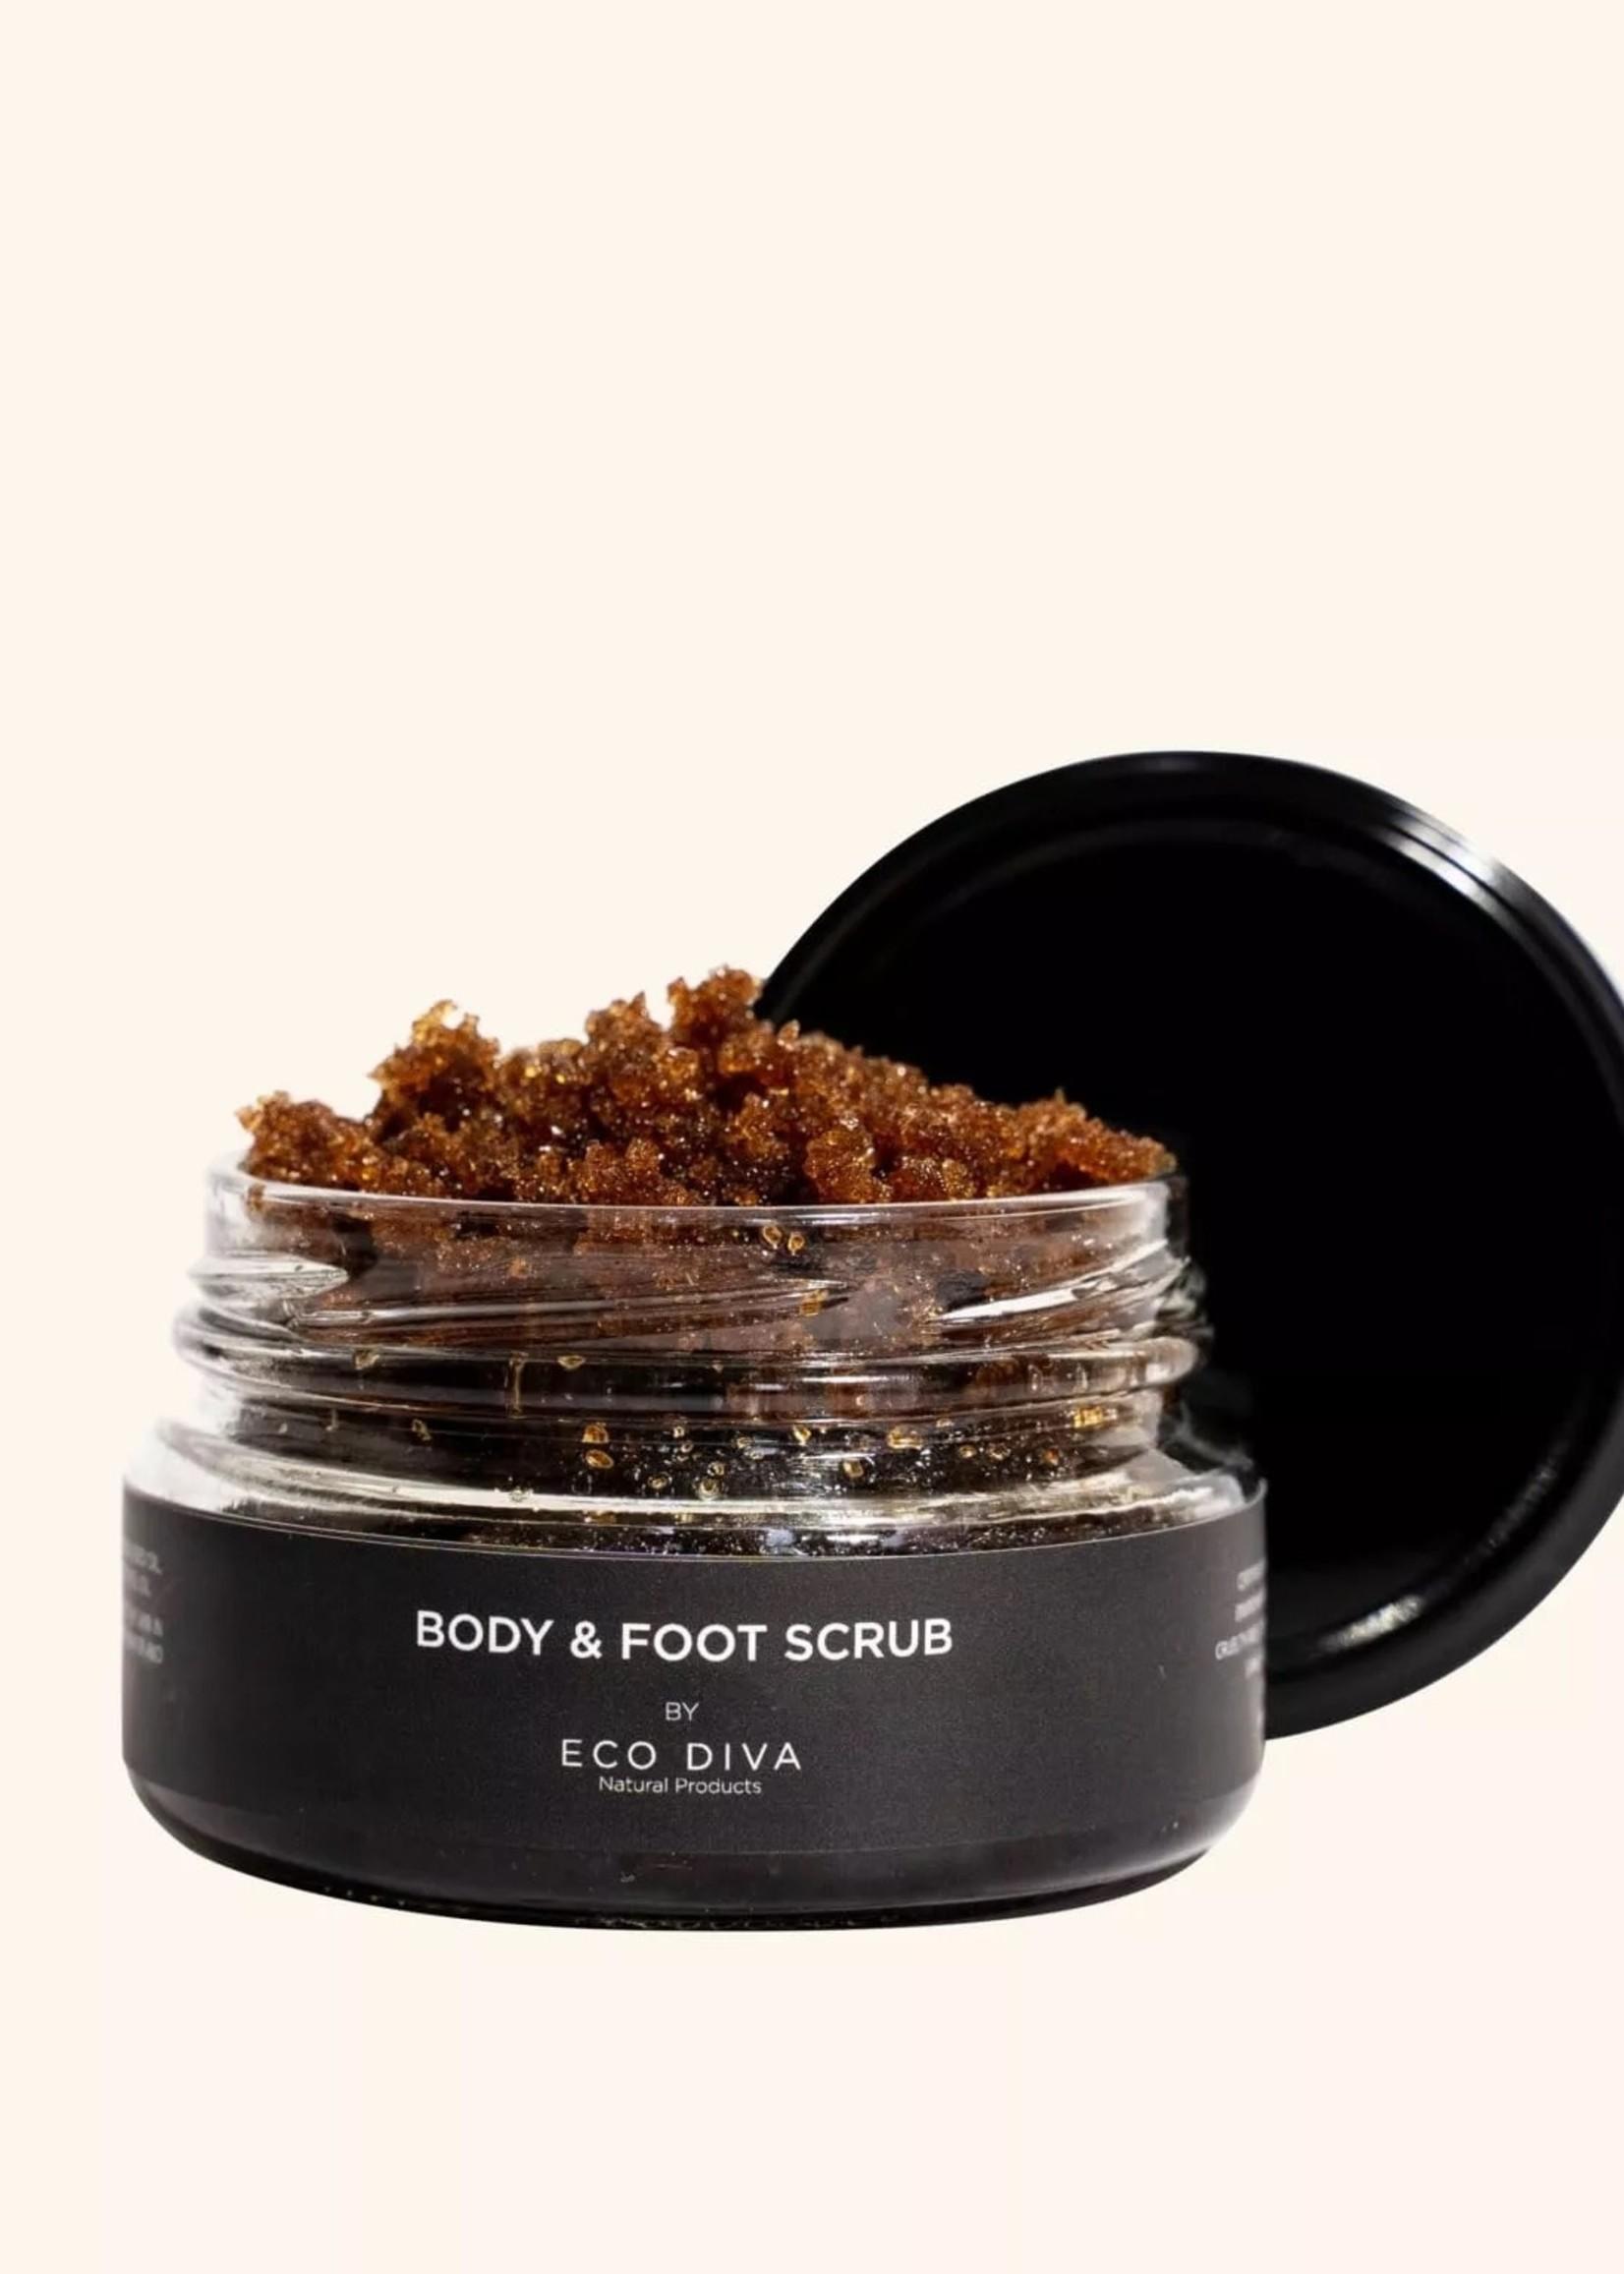 Eco Diva Eco Diva - Body & foot scrub 200g